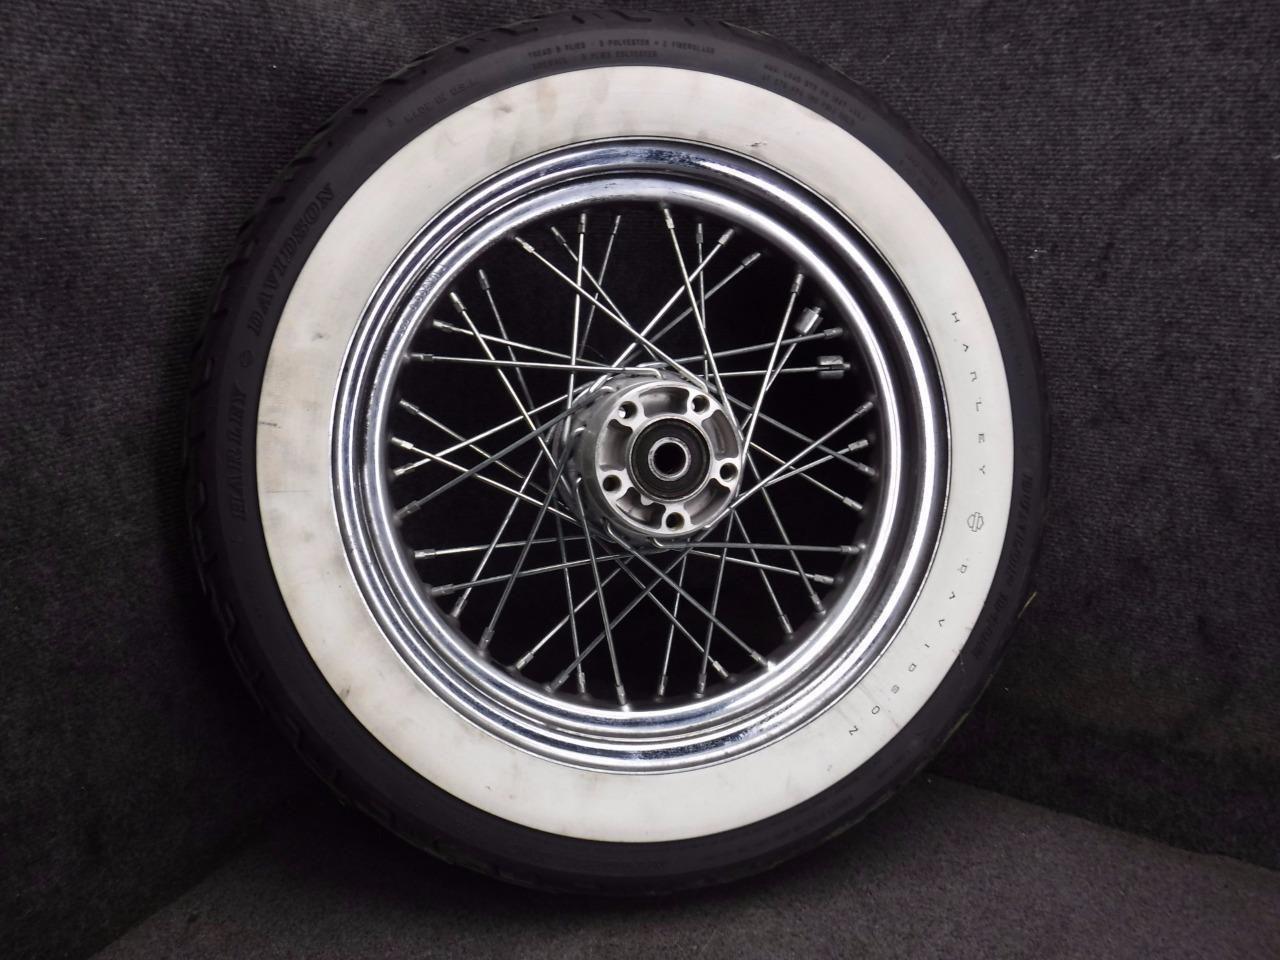 http://motorcyclespareparts.net/01-harley-road-king-flhr-flhrci-rear-rim-wheel-r6a/01 Harley Road King FLHR FLHRCI Rear Rim Wheel R6A